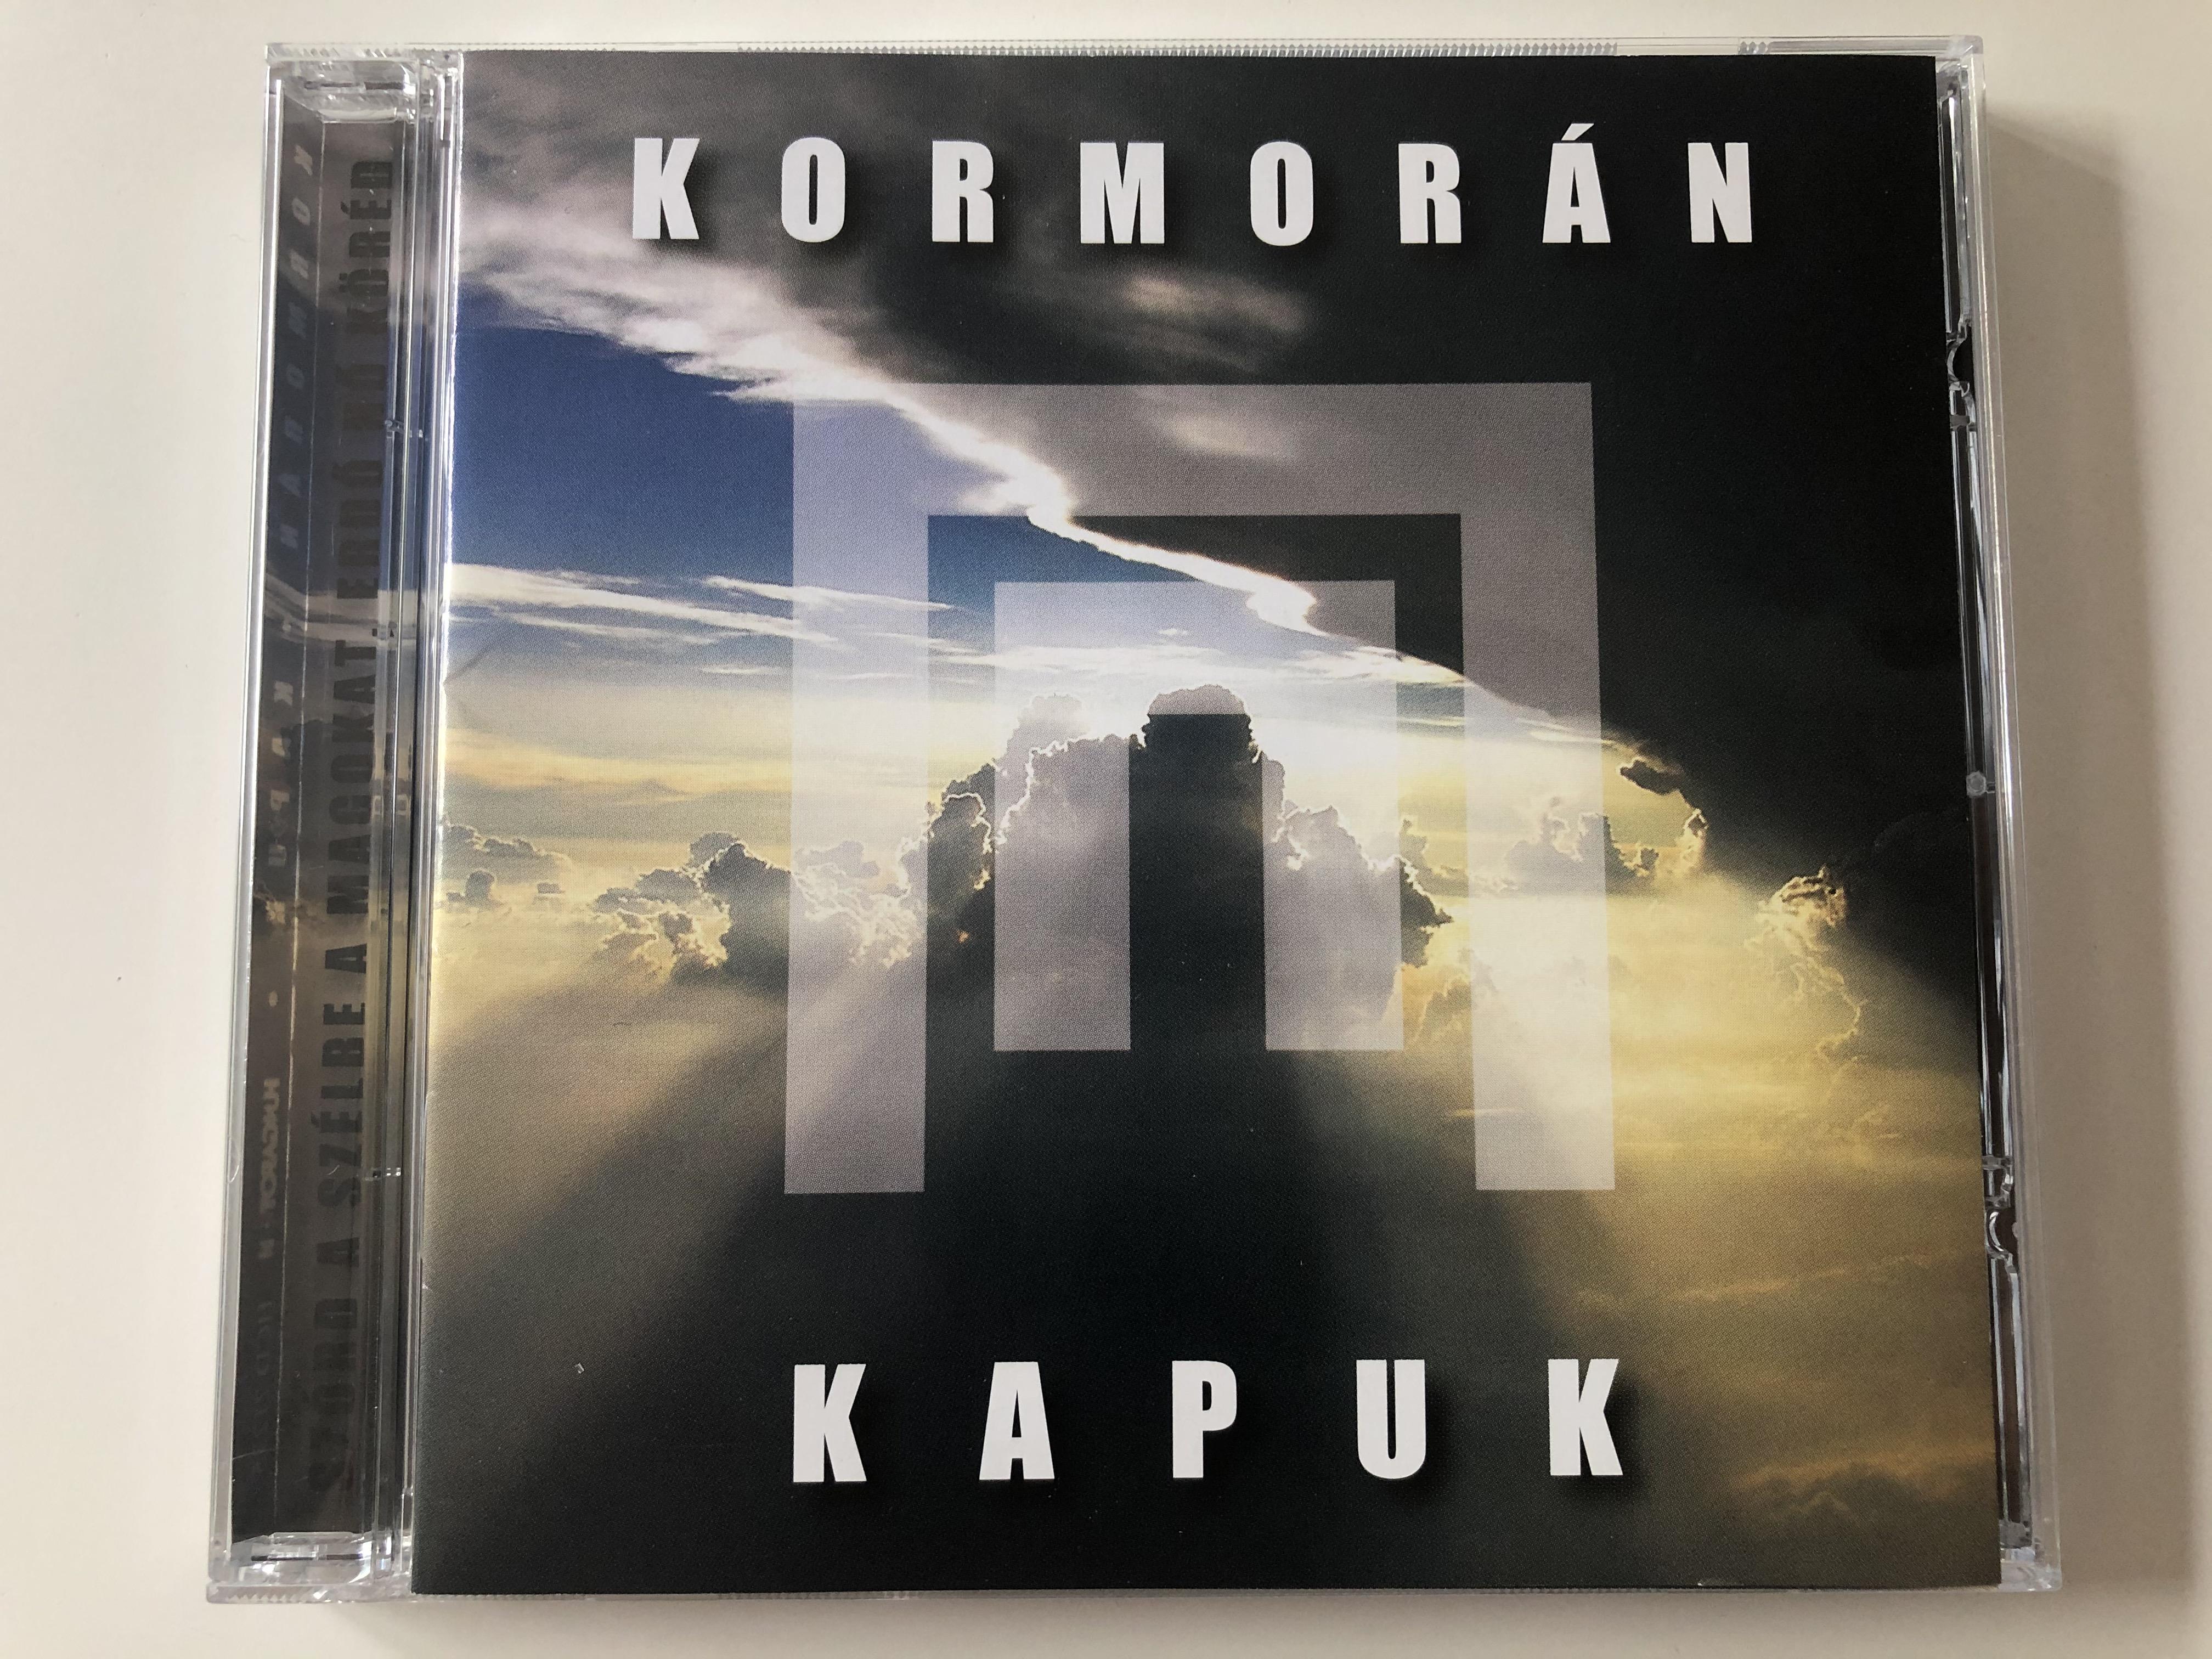 kormor-n-kapuk-hungaroton-audio-cd-2005-hcd-71235-1-.jpg